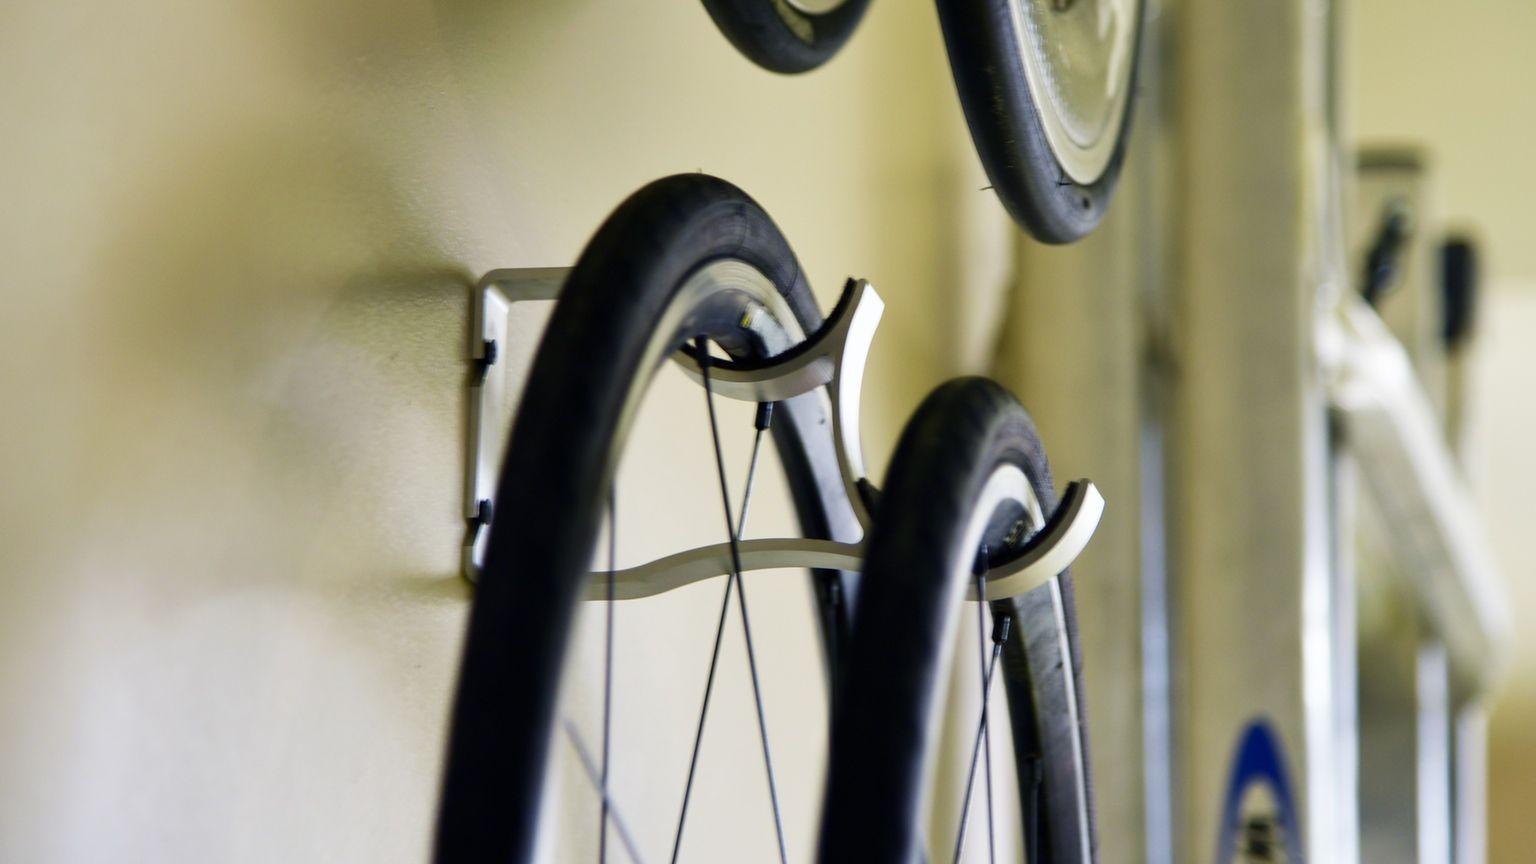 Offset Bicycle Wheel Storage Bike Storage Solutions Bike Storage Bicycle Wheel